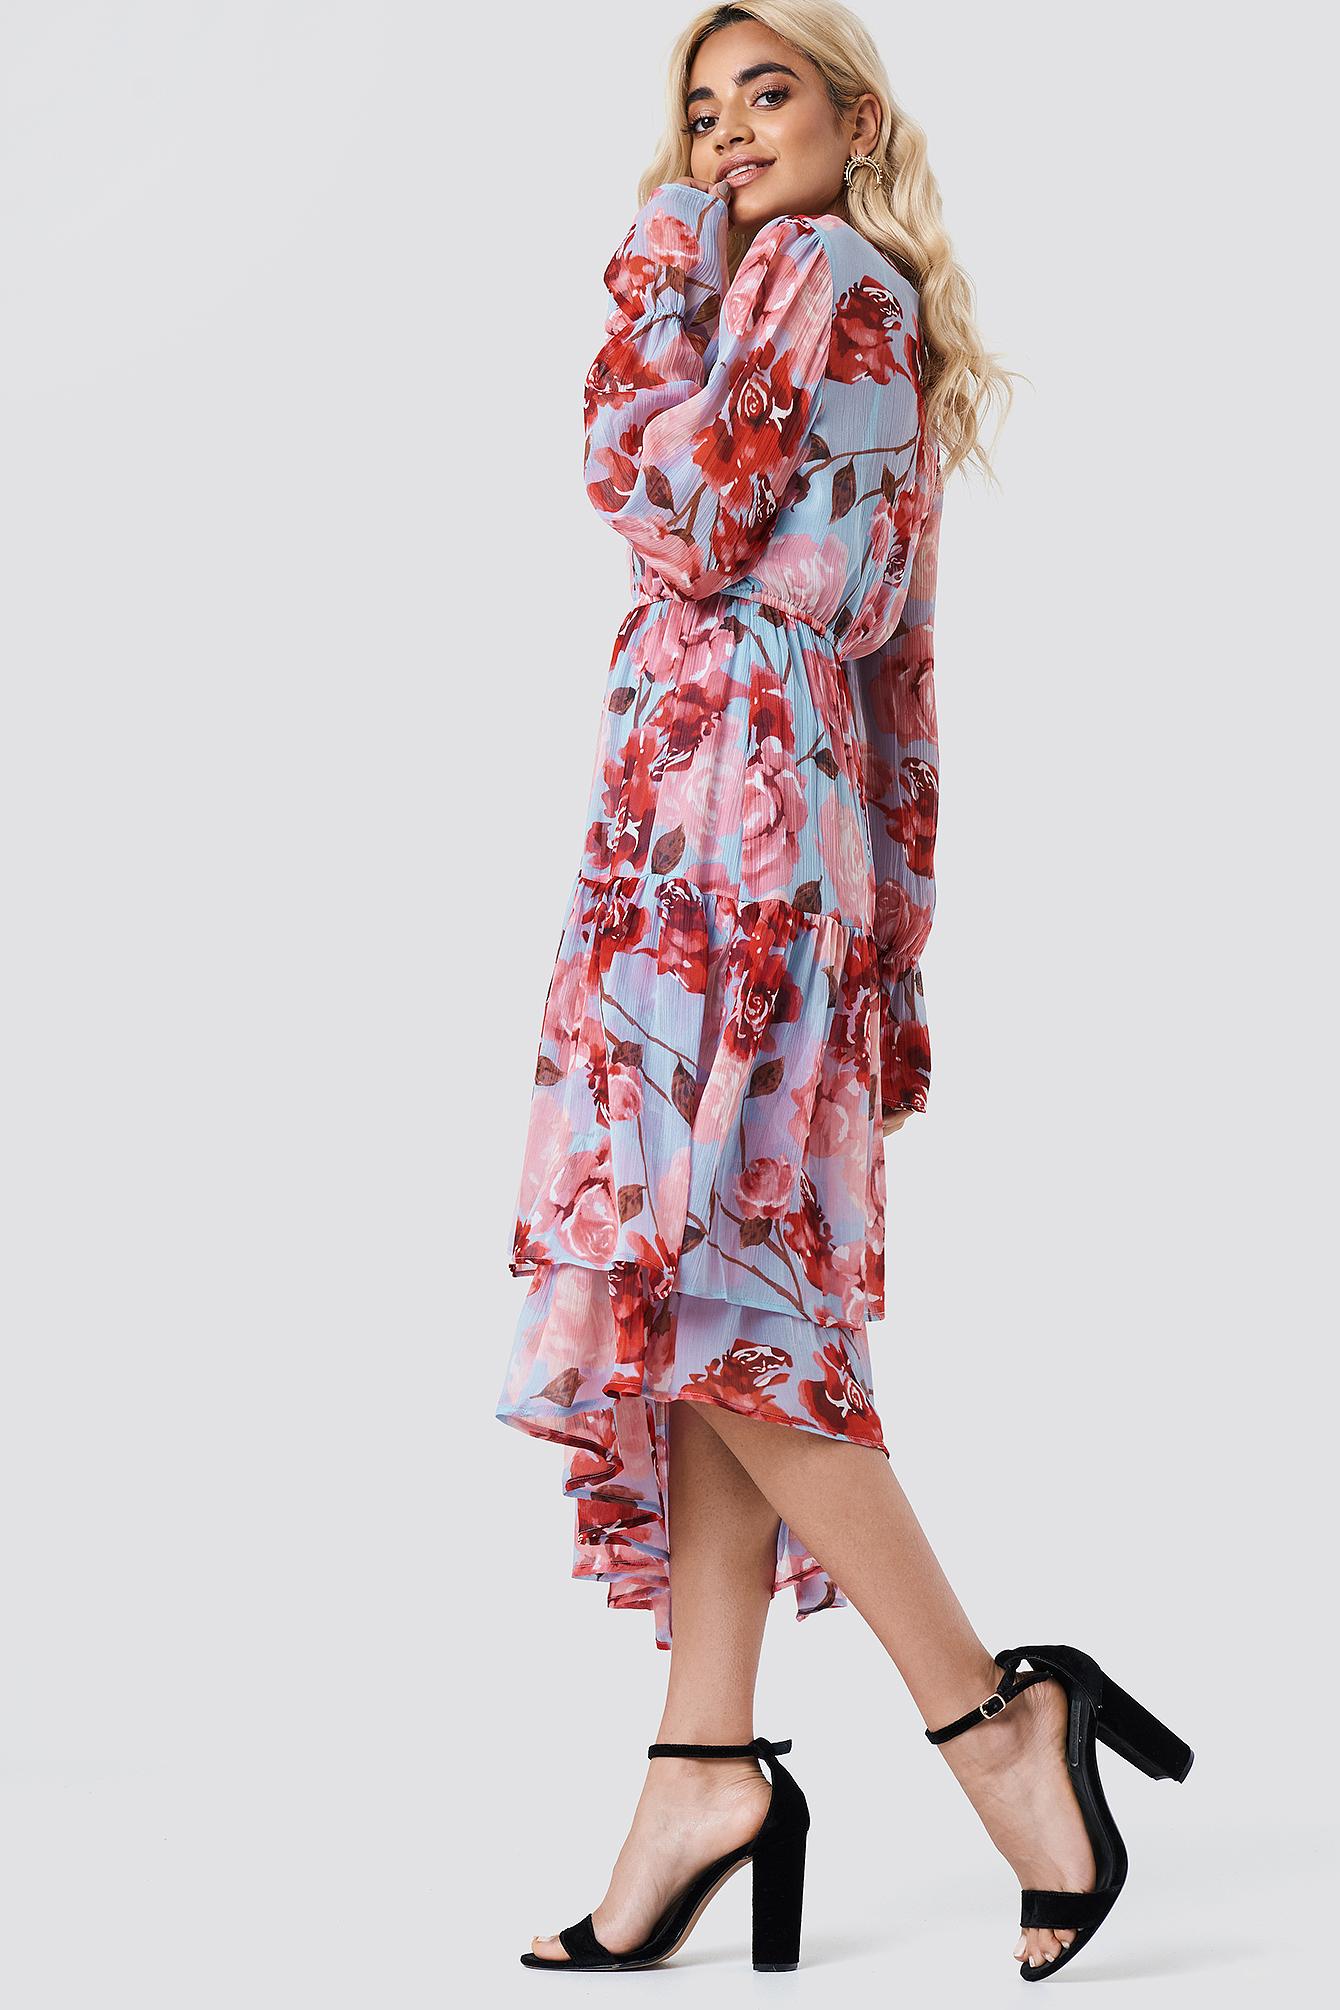 0c7774c66c529 Asymmetric Chiffon Frill Dress Light Blue Pastel Rose